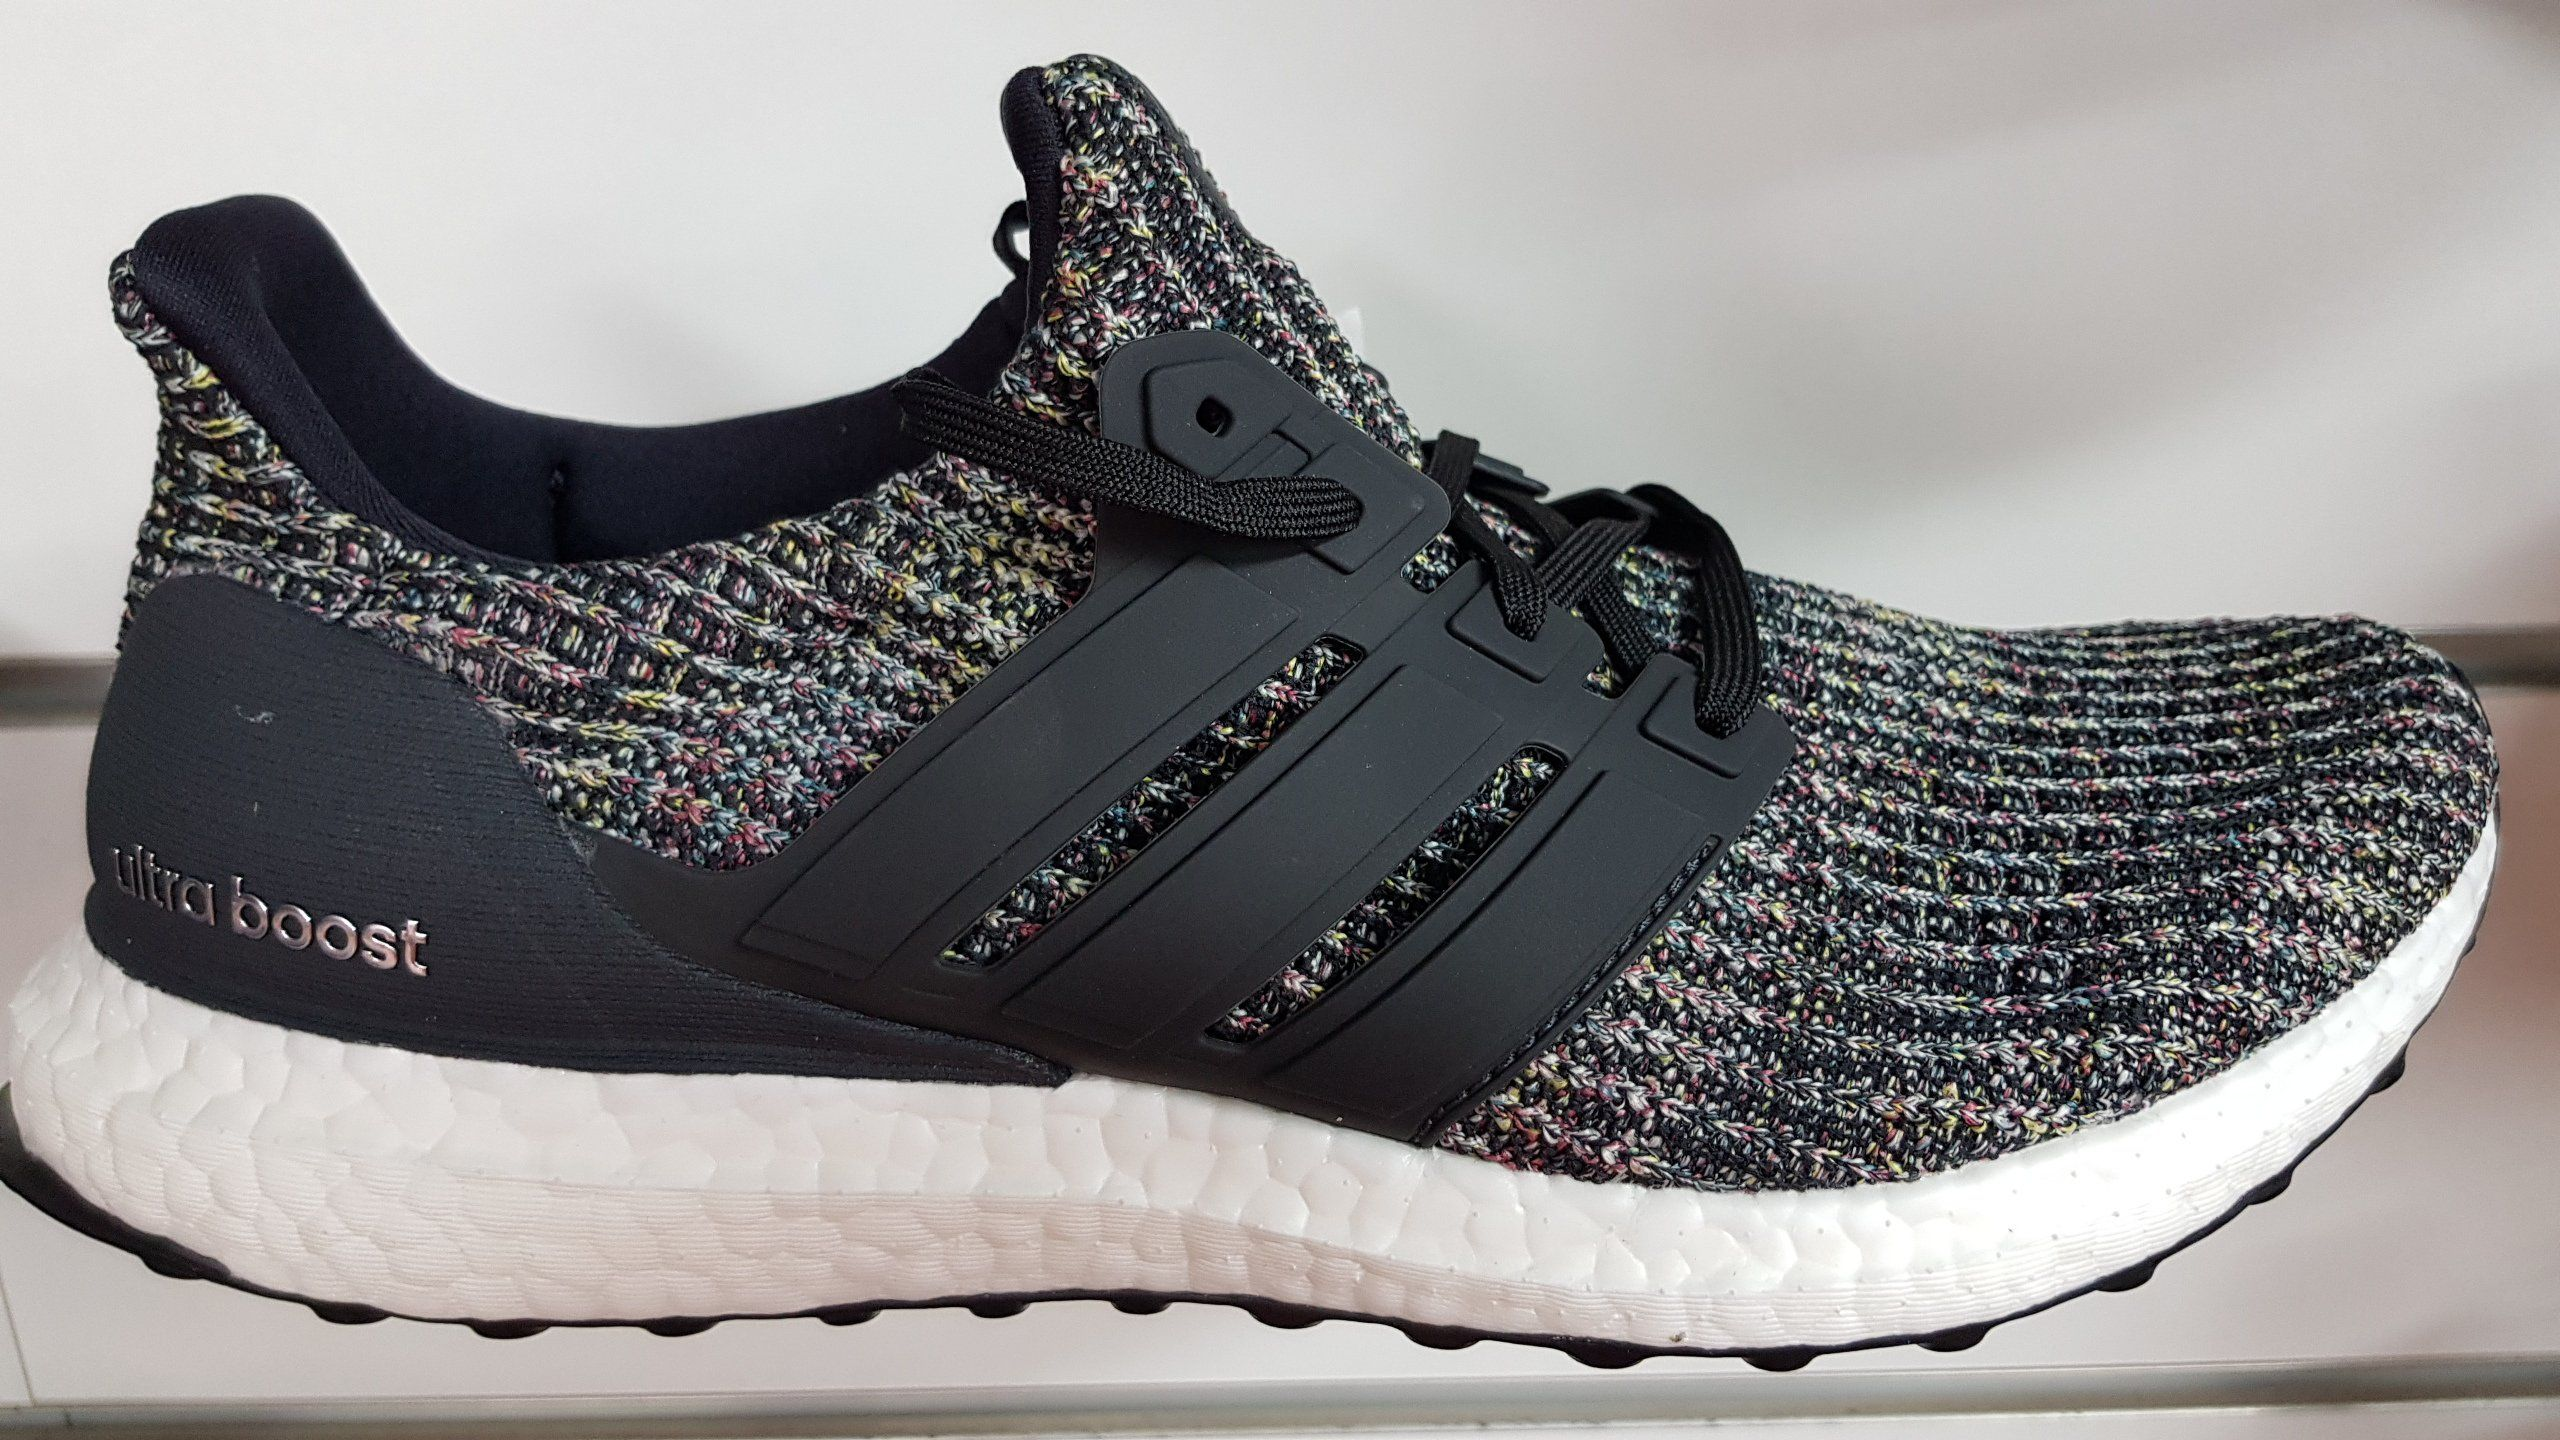 2fb1380095d58 נעל ריצה חדשה מבית אדידס CM8110 לגברים  אדידס  Ultraboost  Adidas  ארוספורט   Arosport  נעלי ספורט  ריצה  מבצעים  נעליים  נעלי ריצה